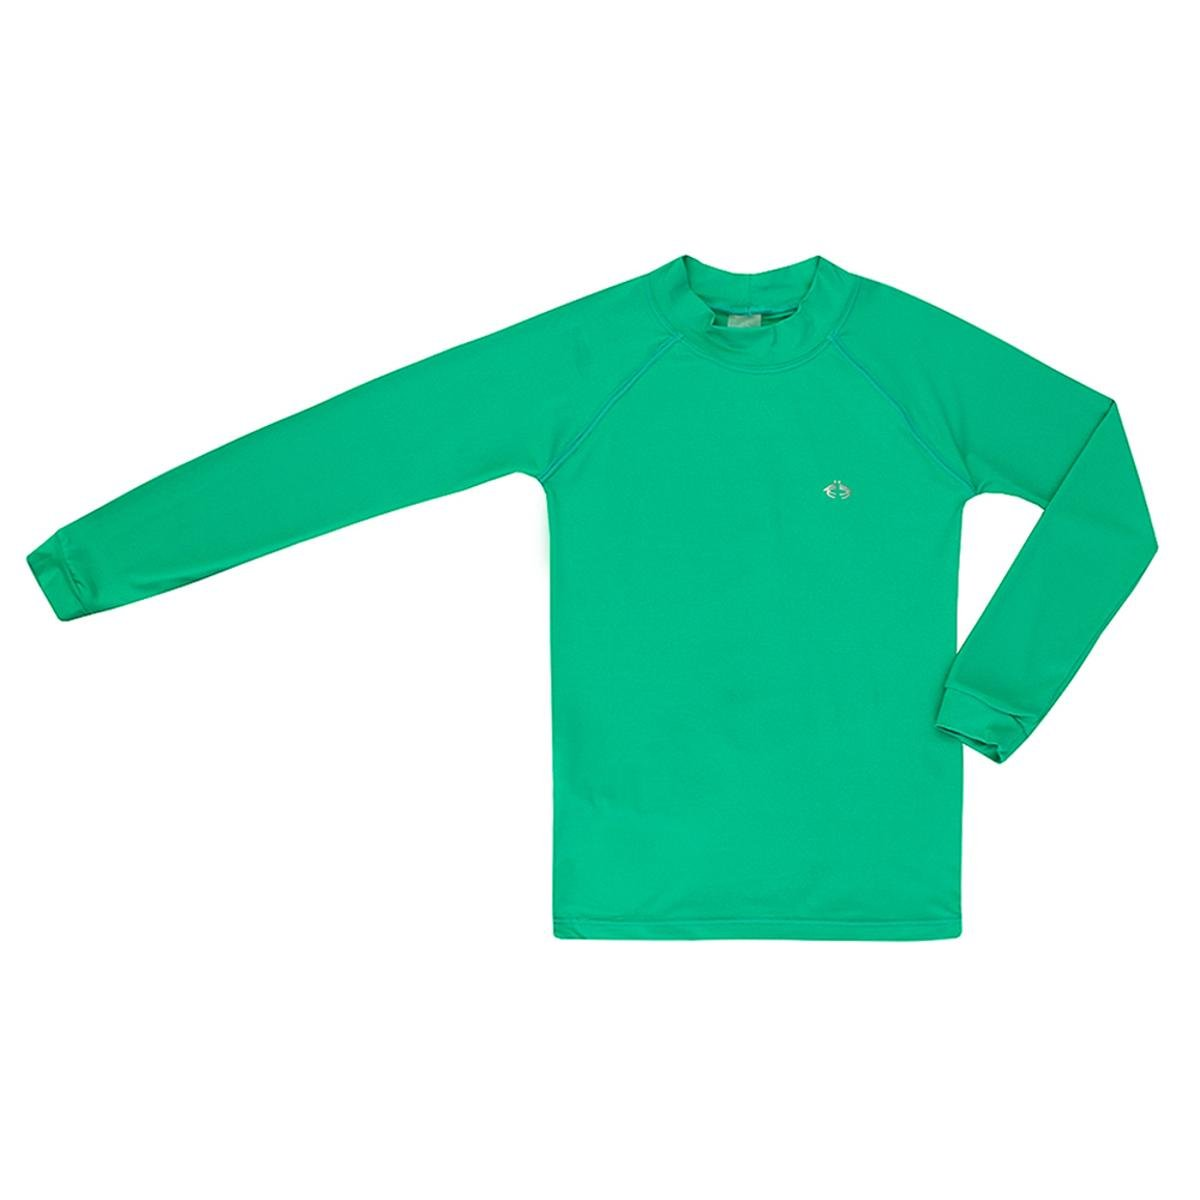 Camiseta Infantil Kids Proteção UV 50+ Peter Pan Siri Masculina - Compre  Agora  1ba69c9b940